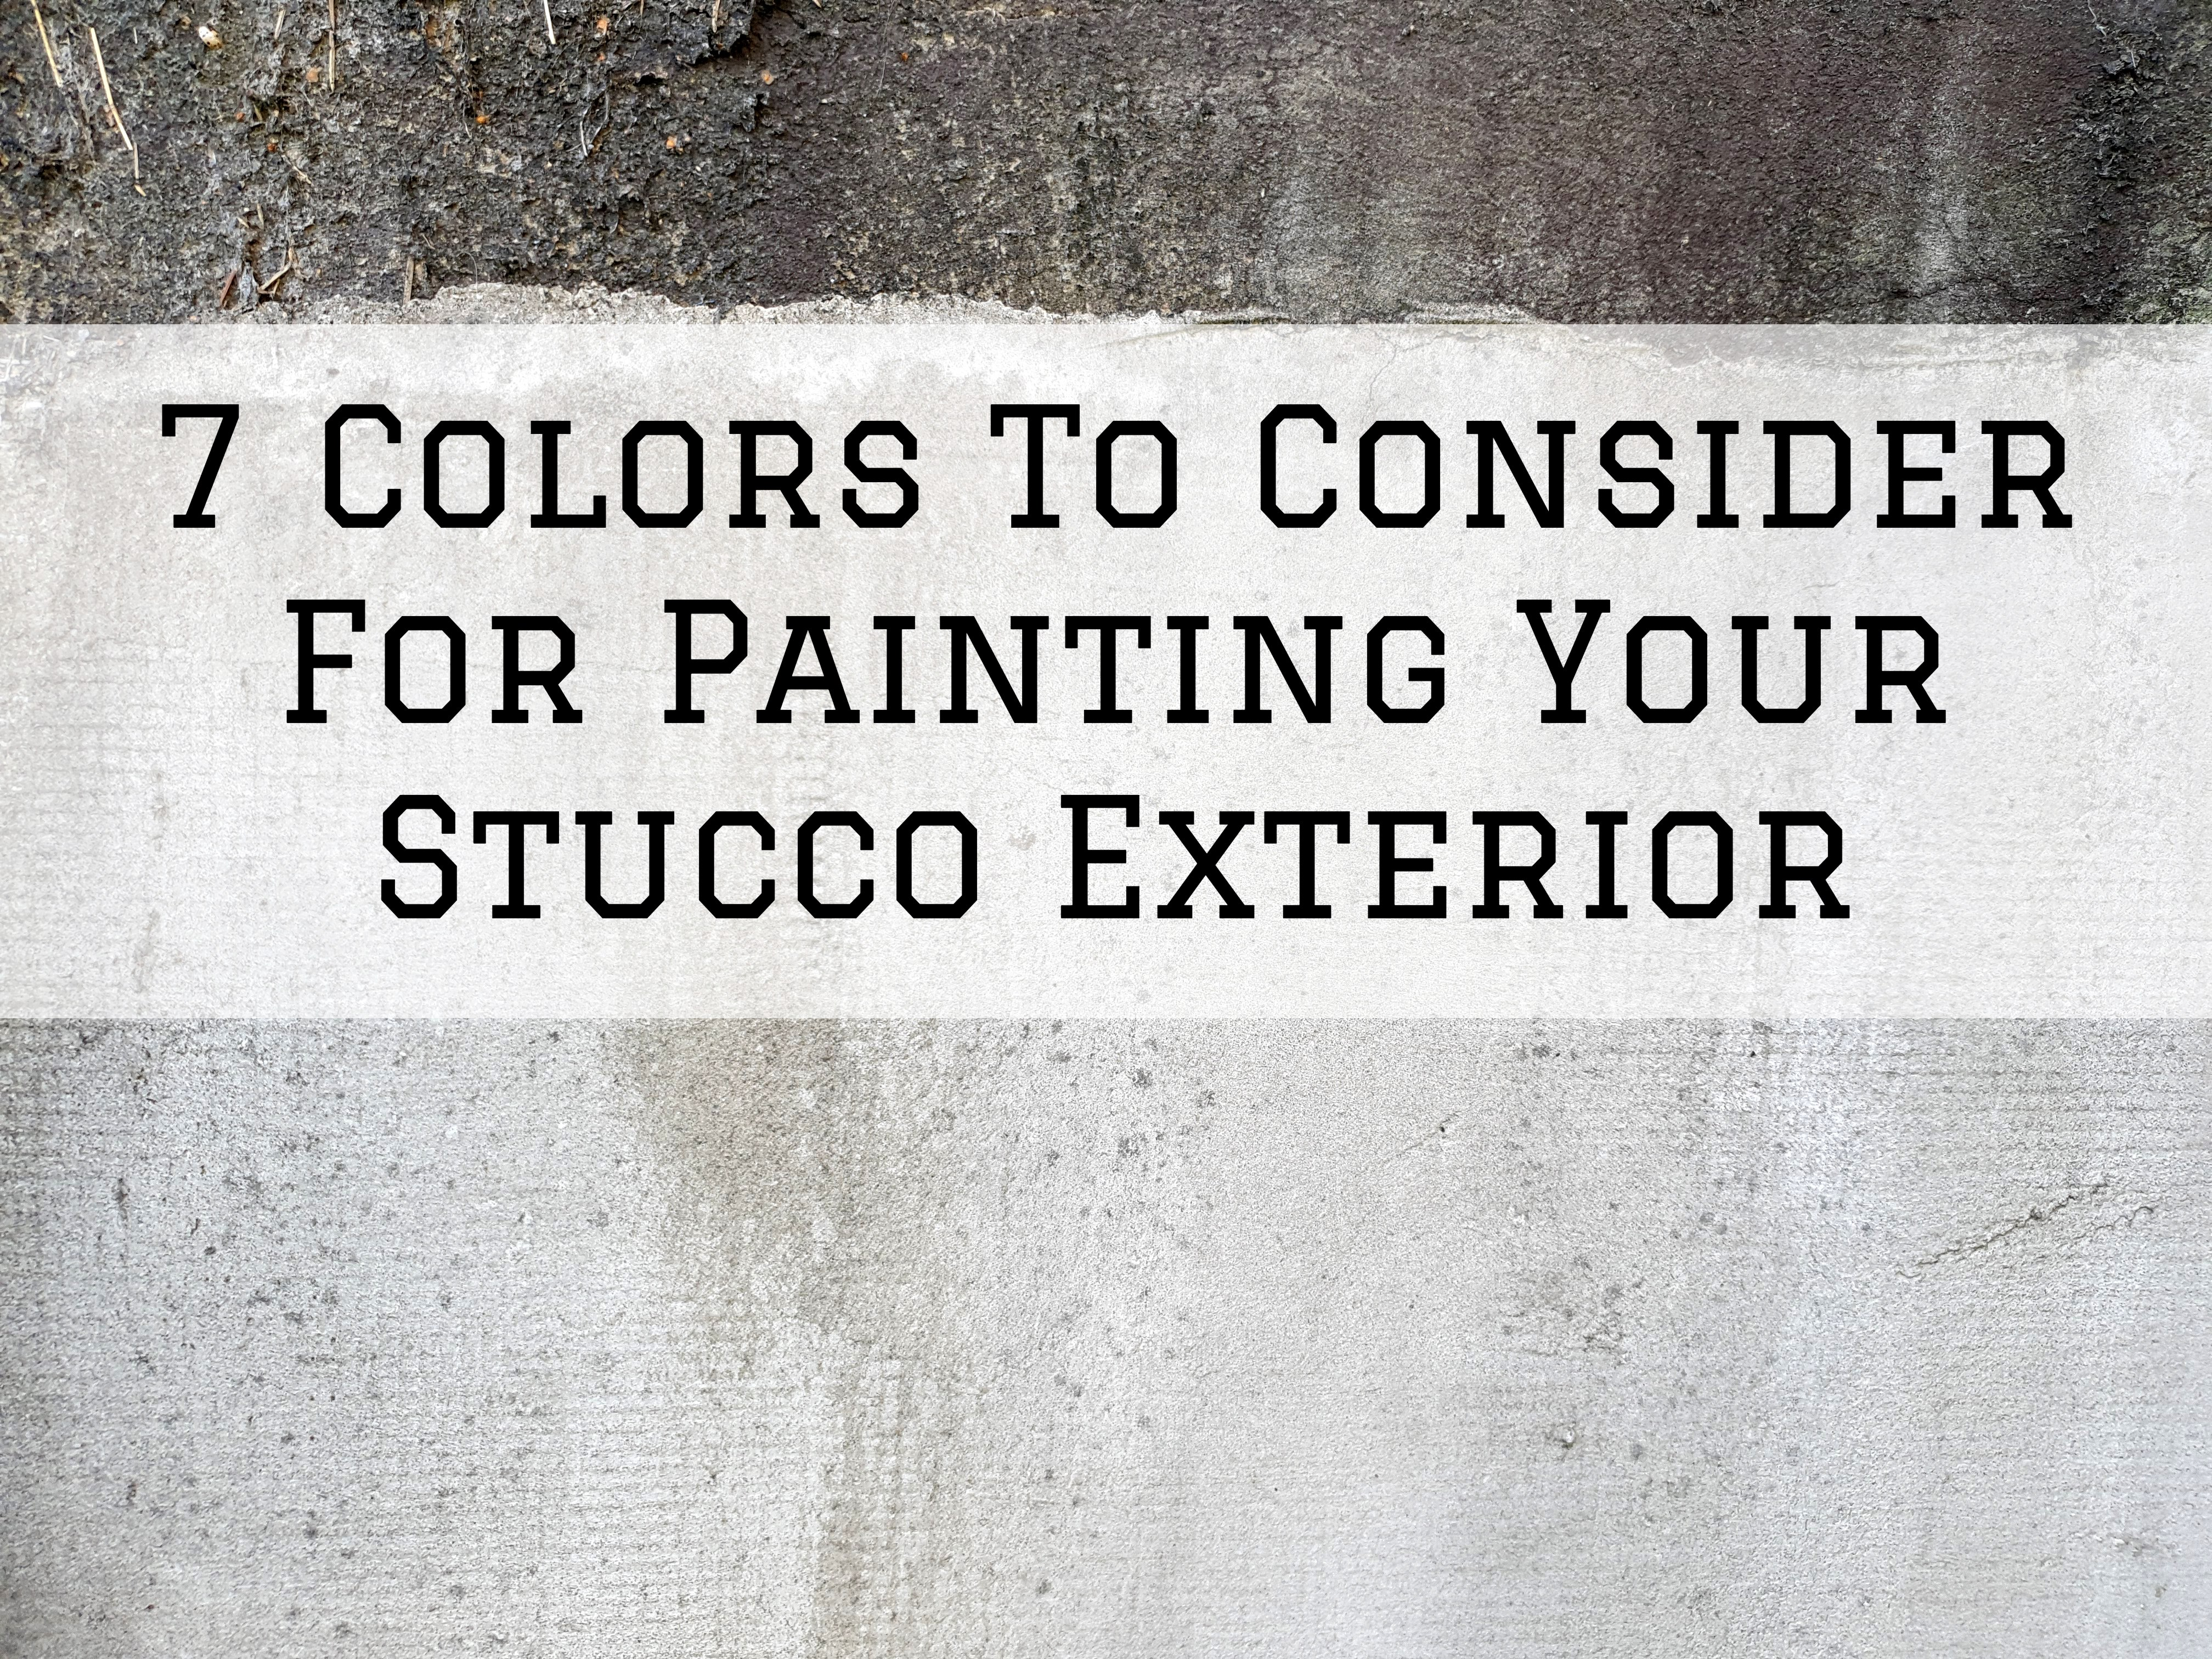 2021-02-02 Selah Painting St Louis MO Stucco Exterior Colors